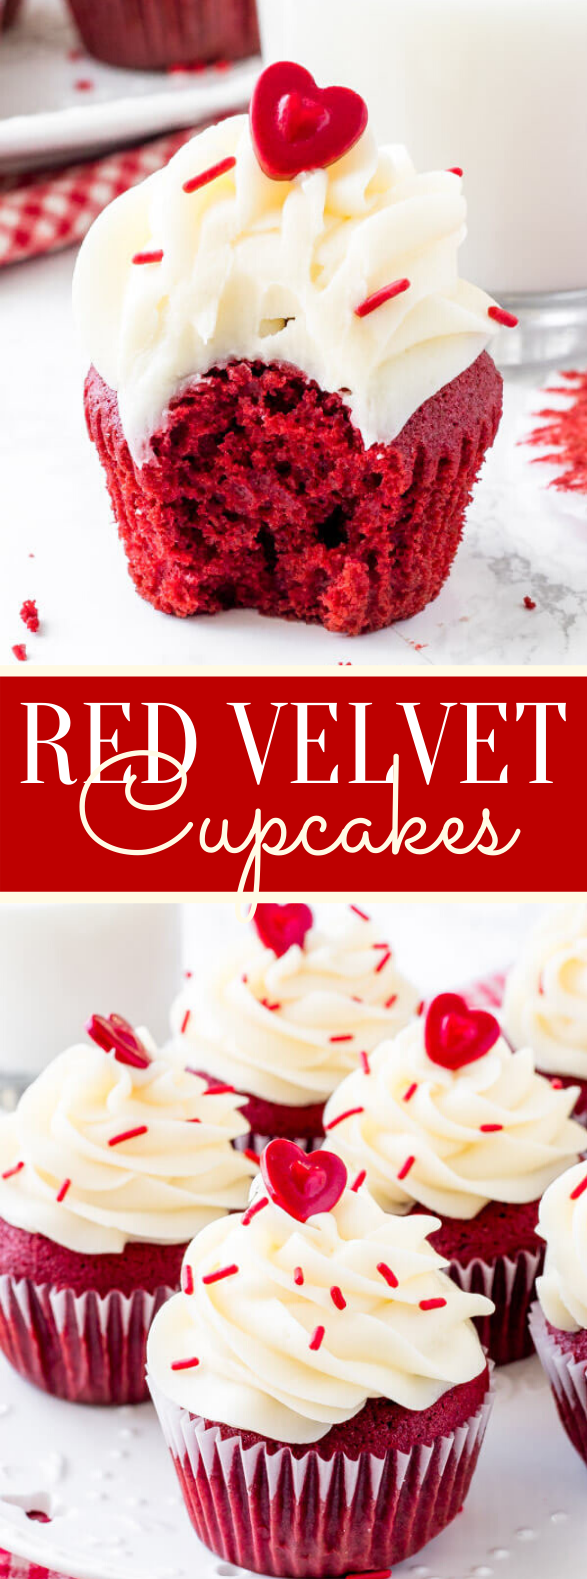 Red Velvet Cupcakes #desserts #cake